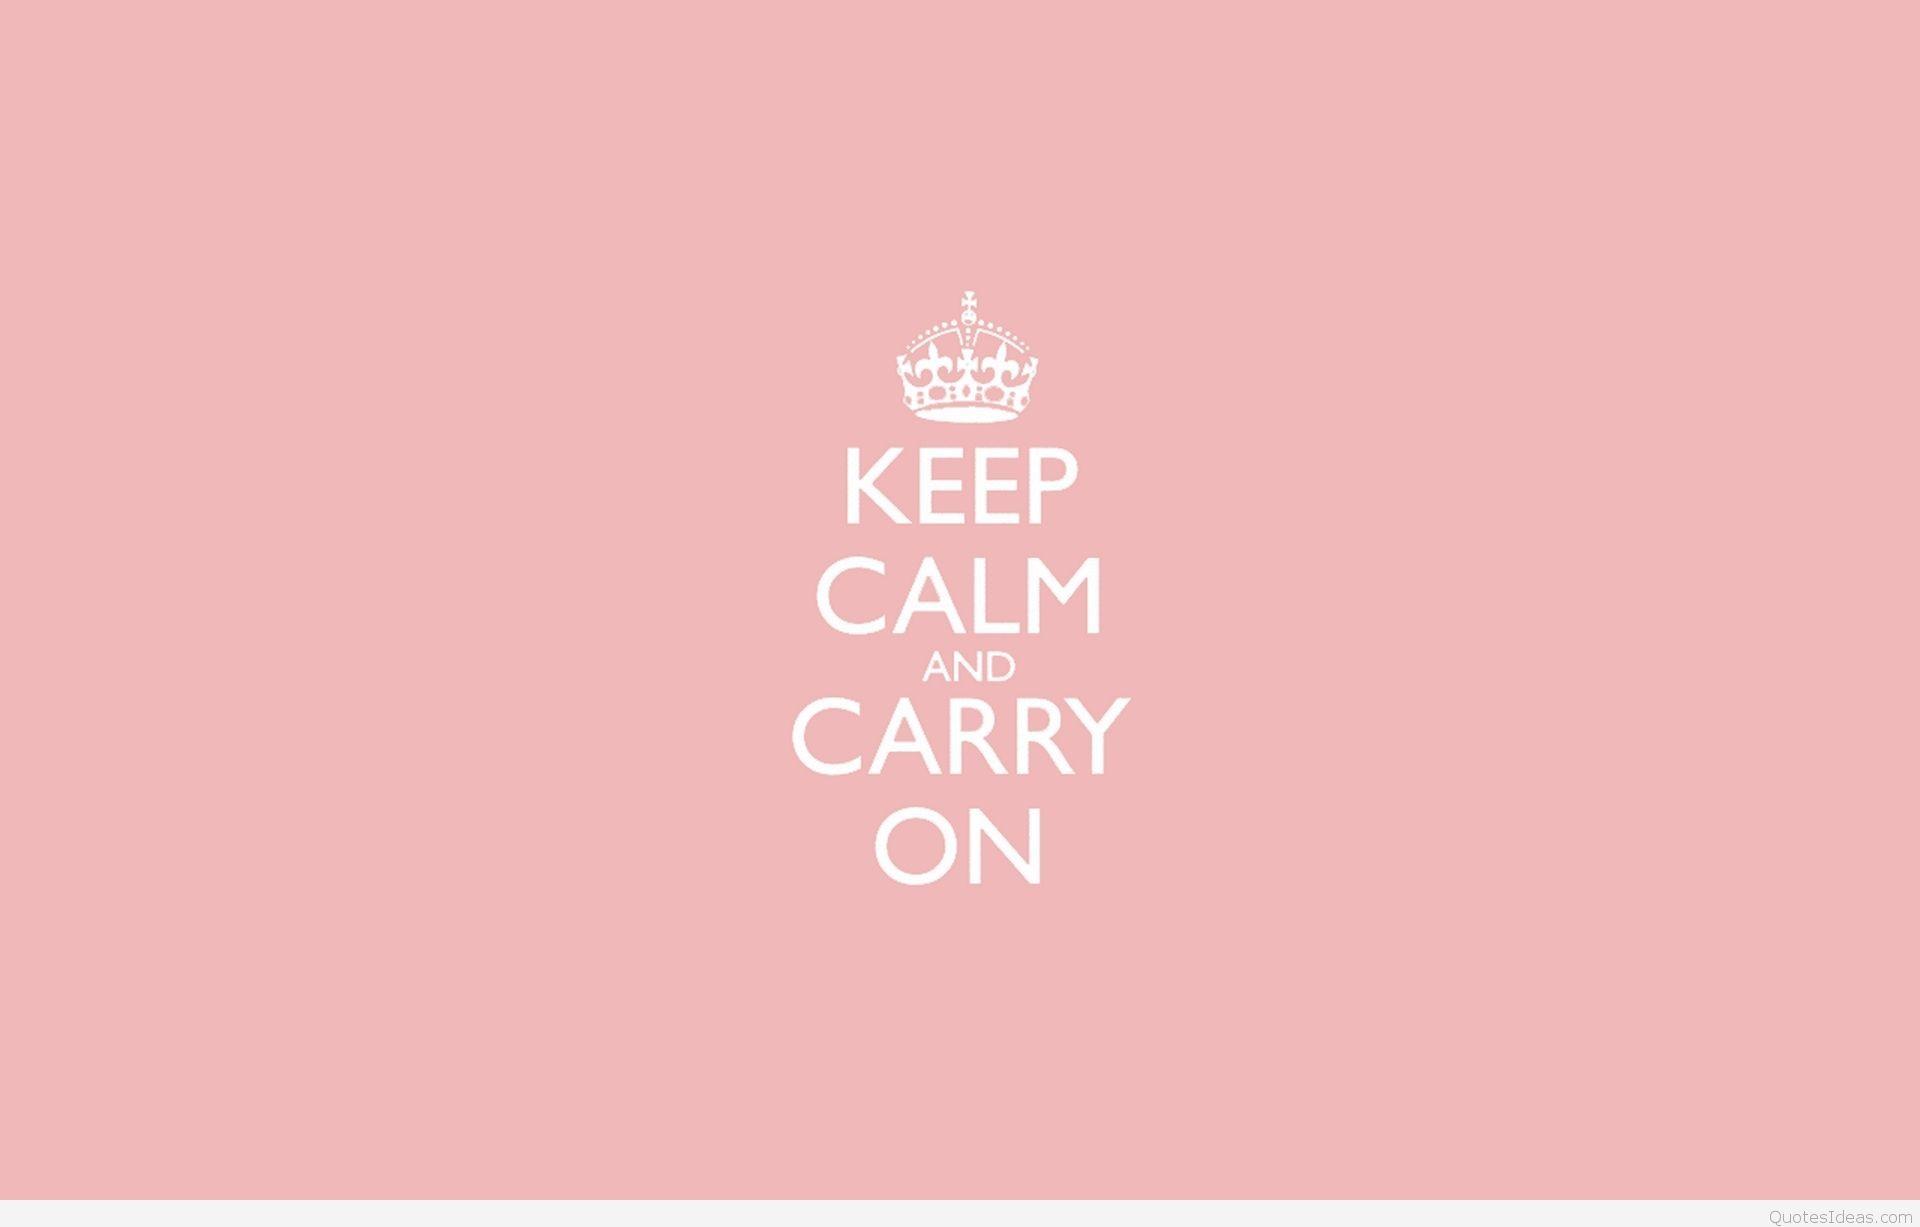 37018-keep-calm-and-carry-on-wallpaper-desktop